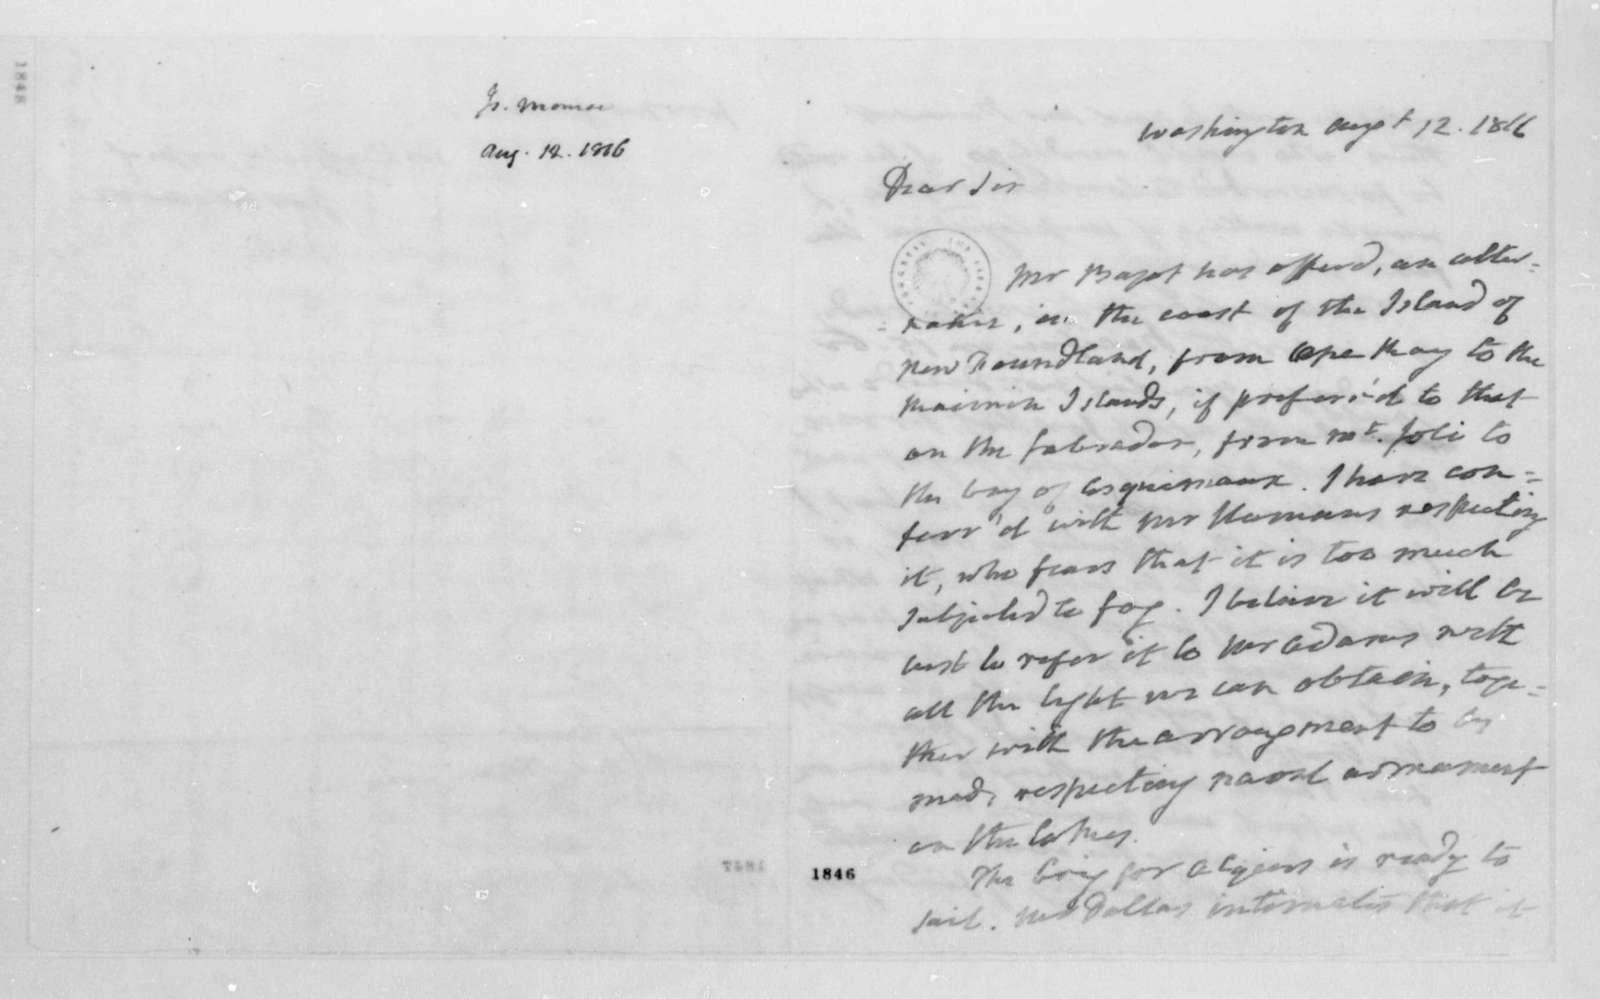 James Monroe to James Madison, August 12, 1816.